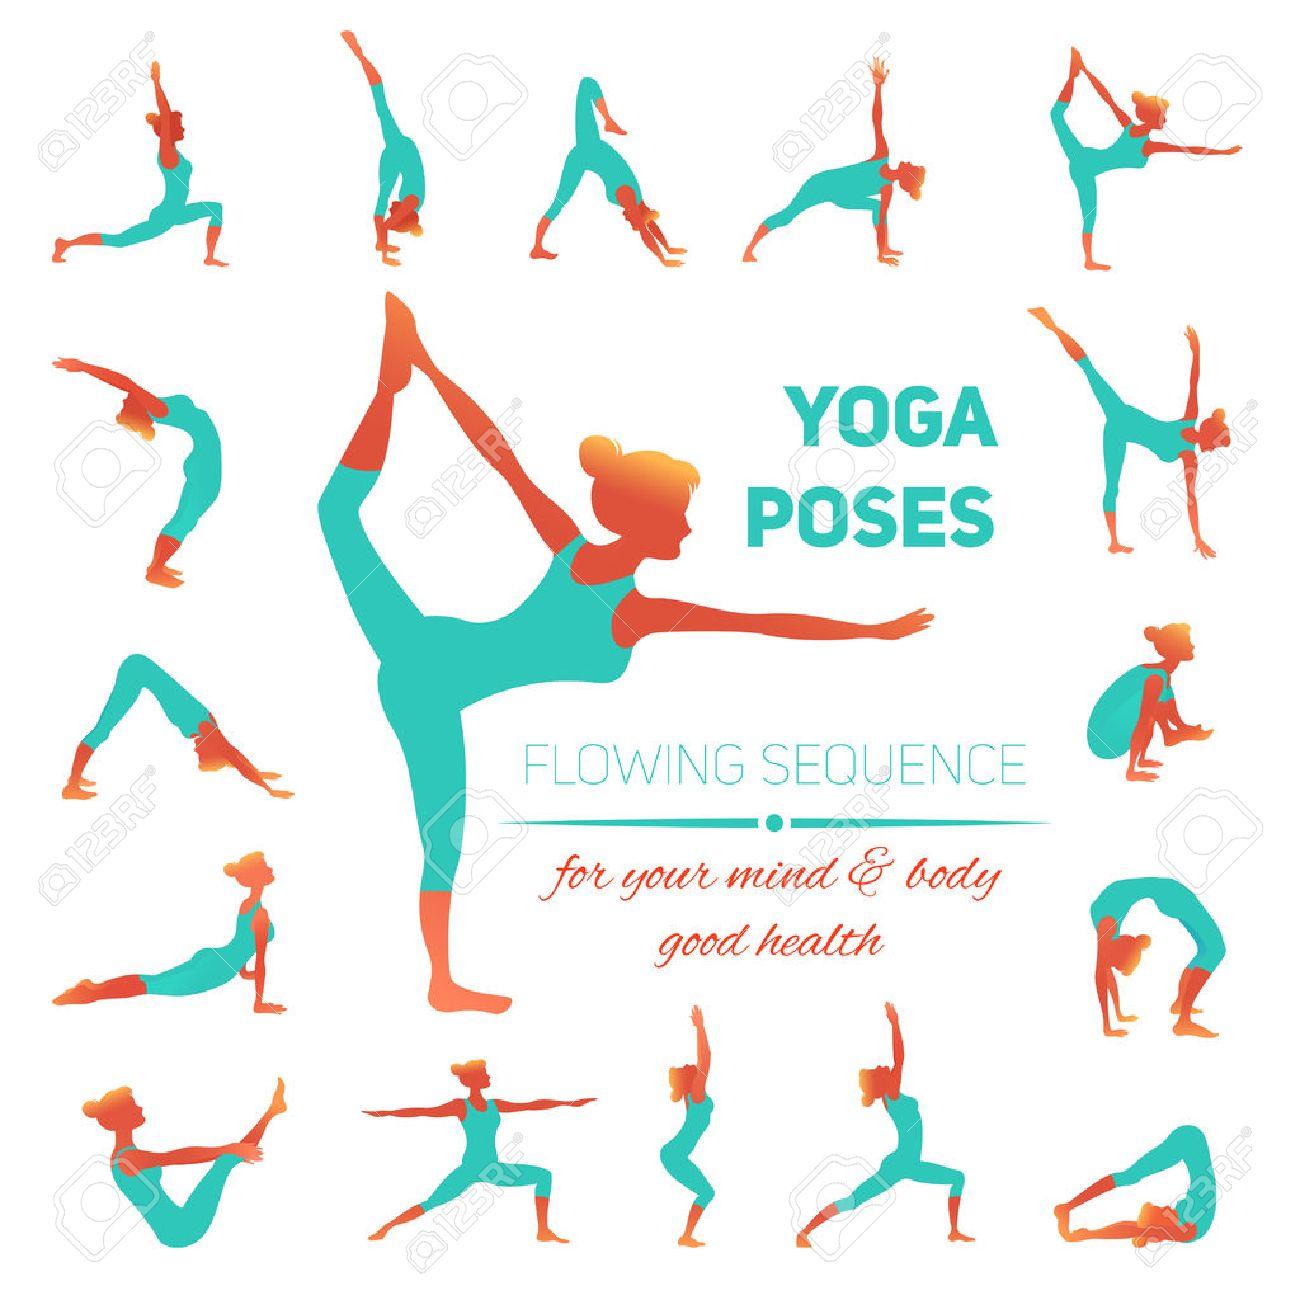 Postures De Yoga Ensemble D\'icônes Avec Des Figures De Femmes Qui ...